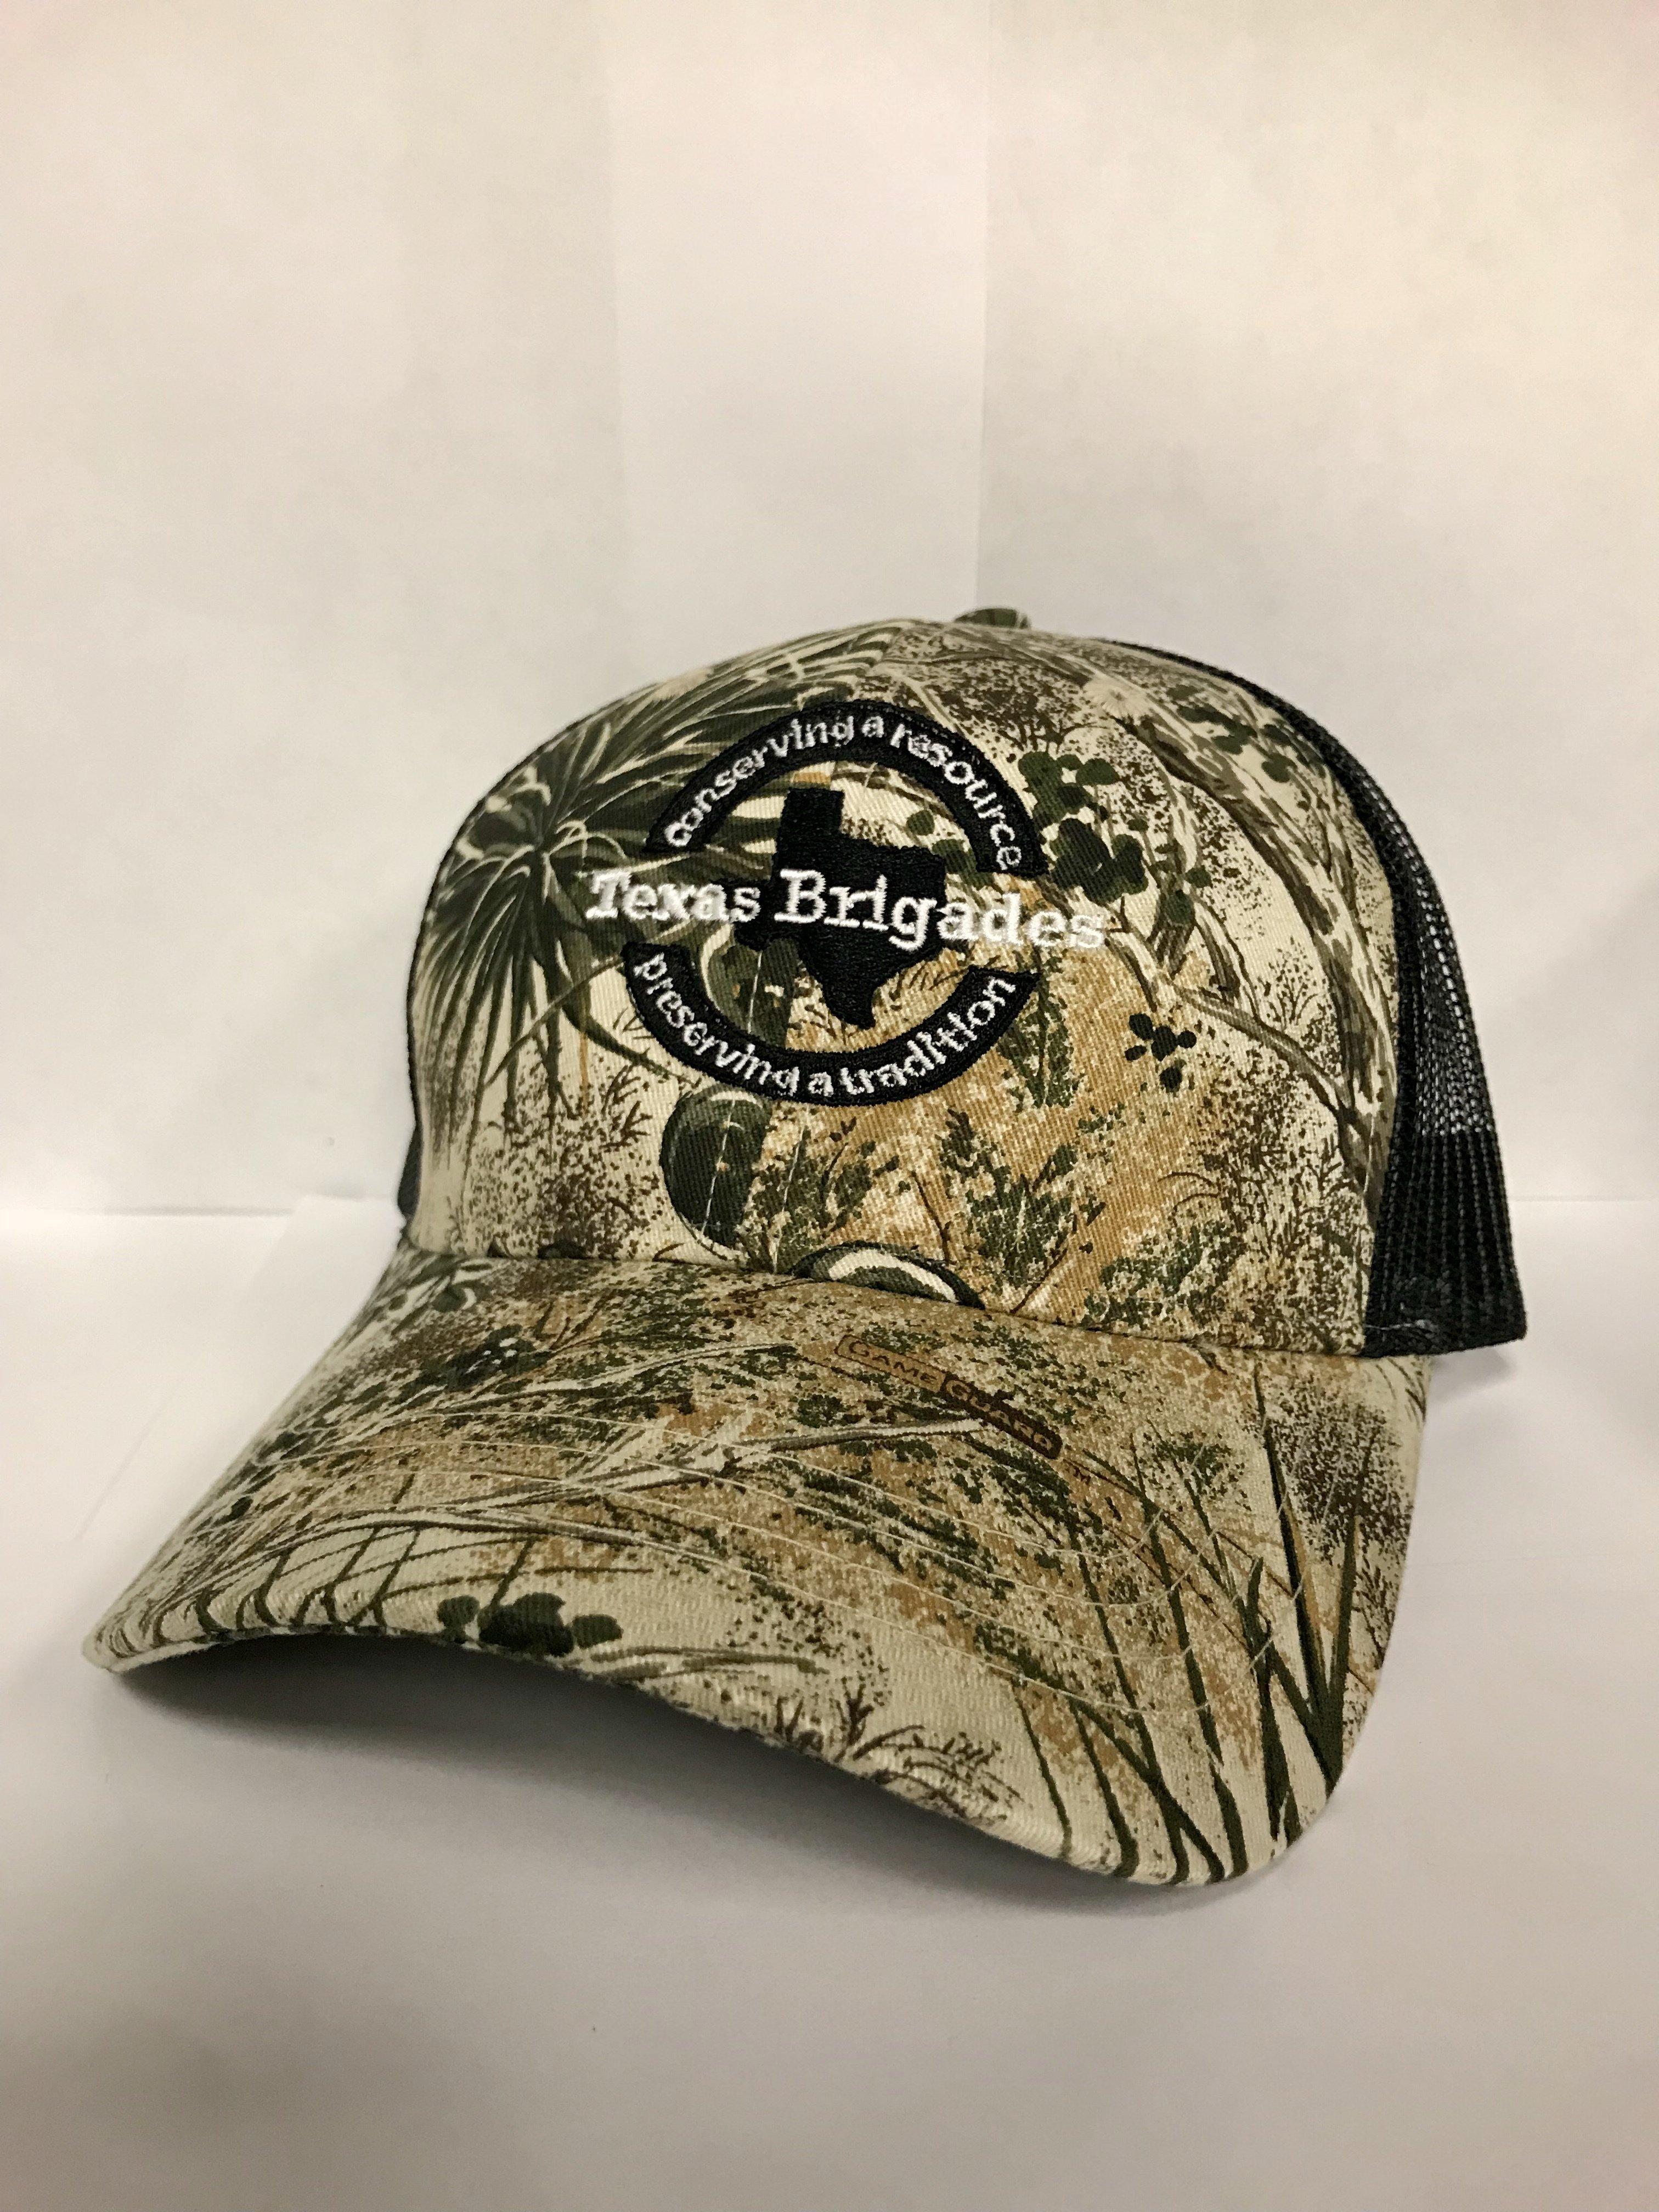 Texas Brigades Game Guard Camo Hat 00003